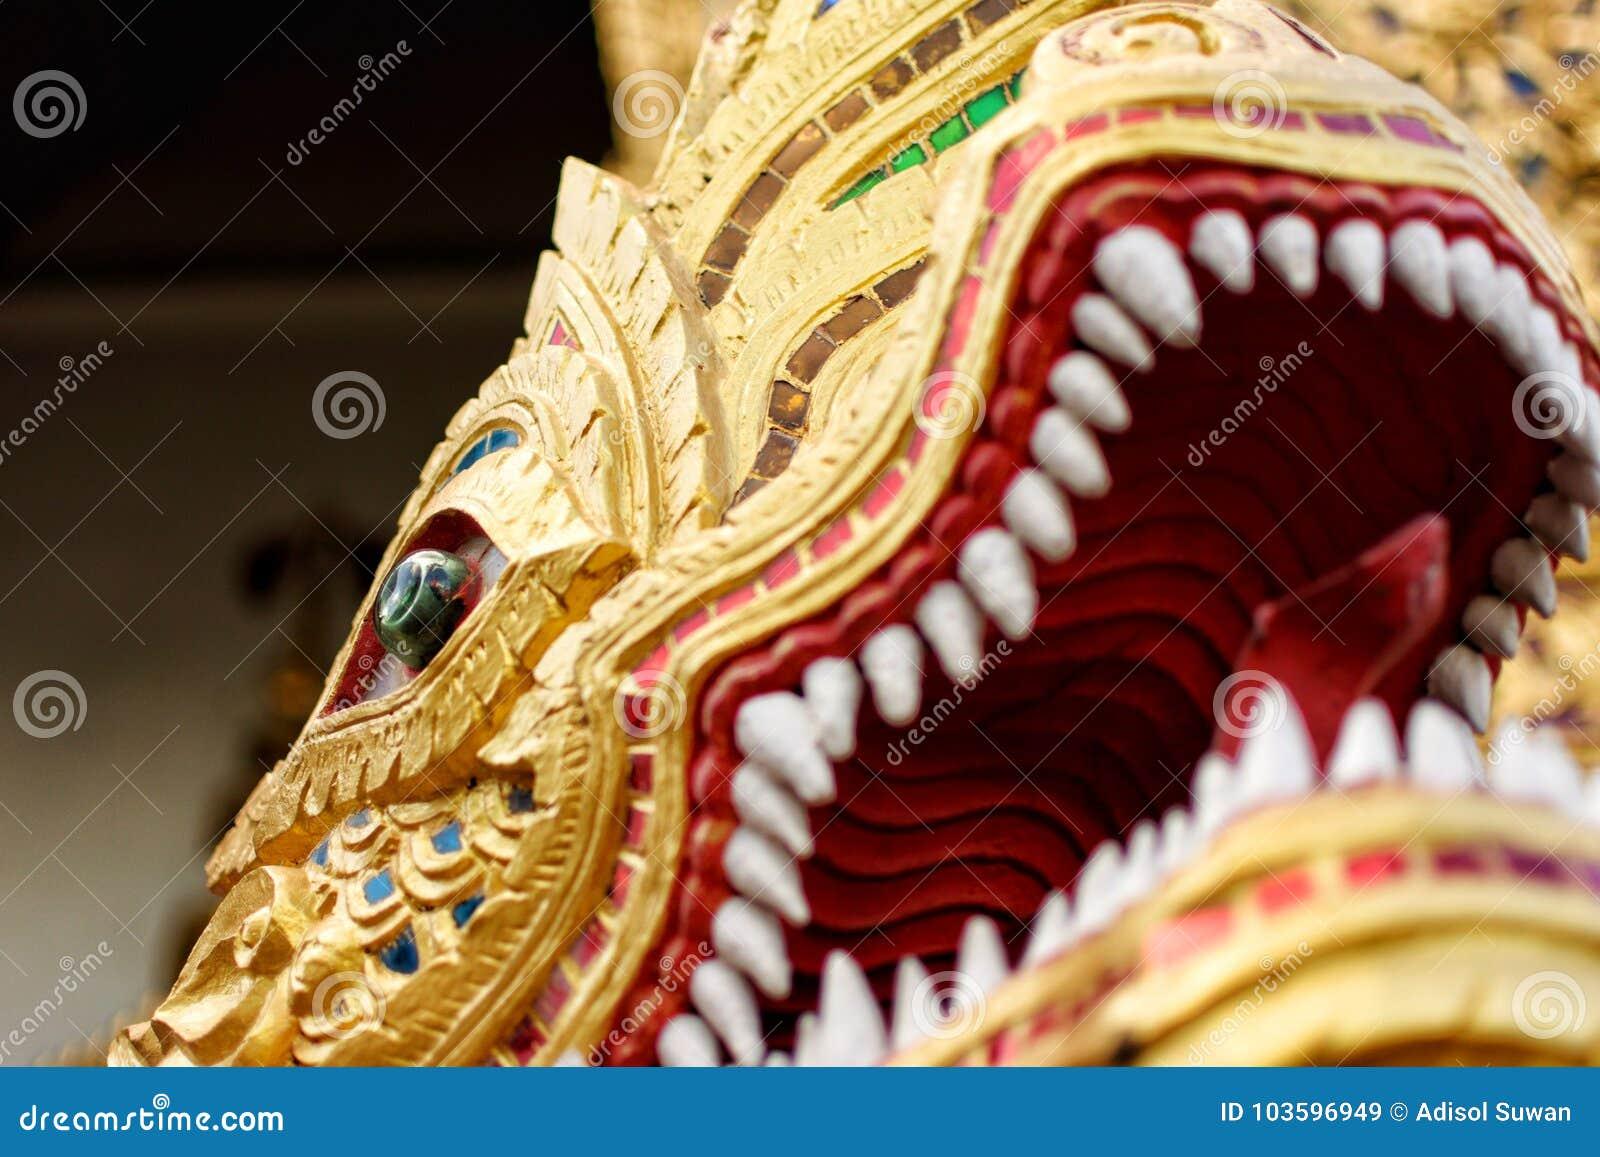 Phra Ya NAK, wat phra singha